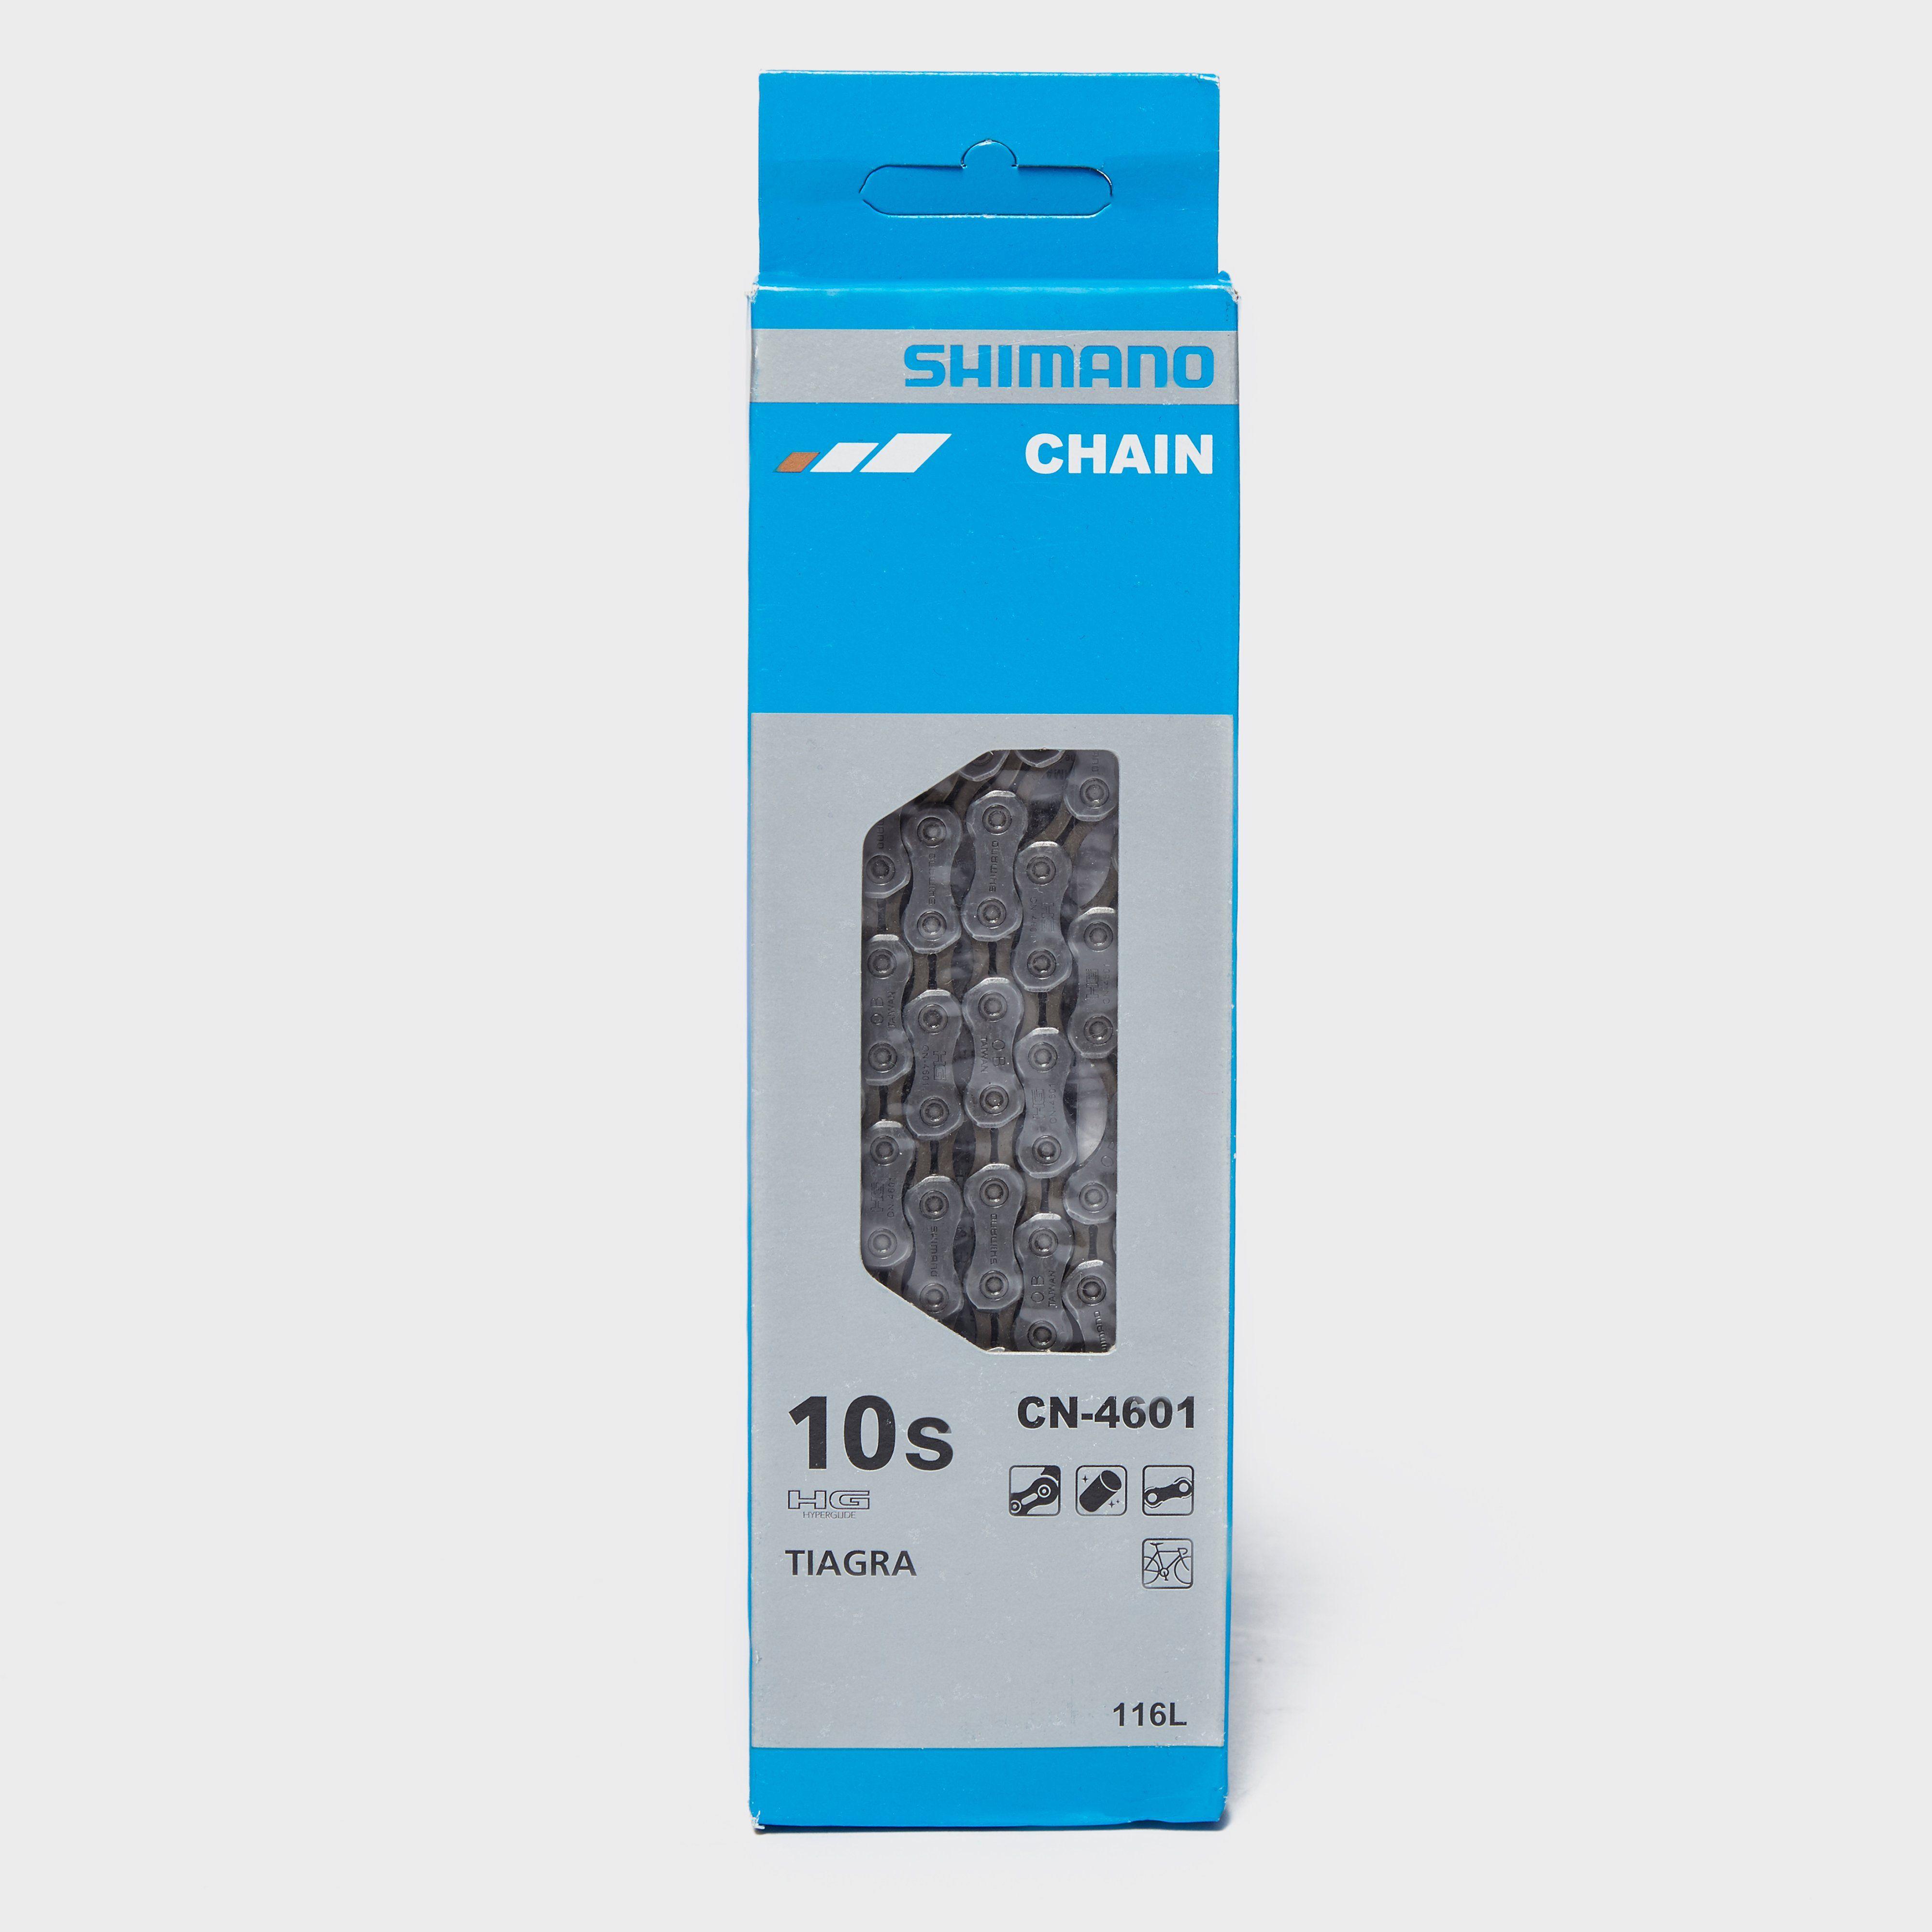 SHIMANO Tiagra 4601 10 Speed Chain